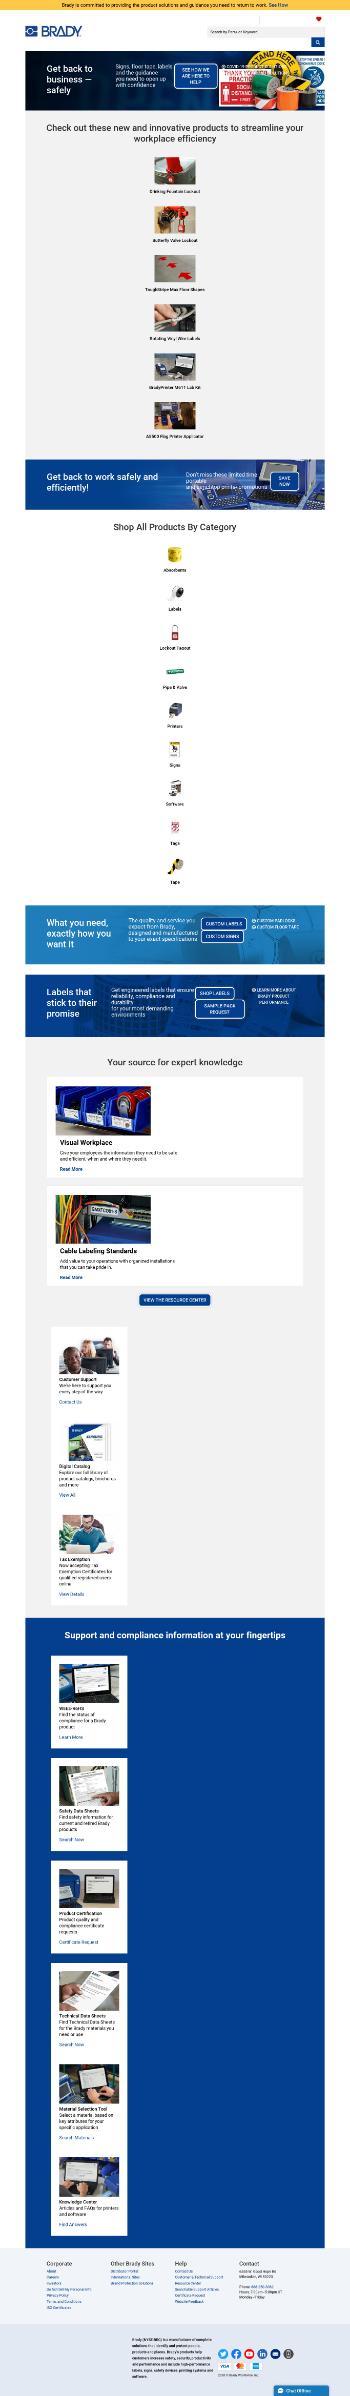 Brady Corporation Website Screenshot